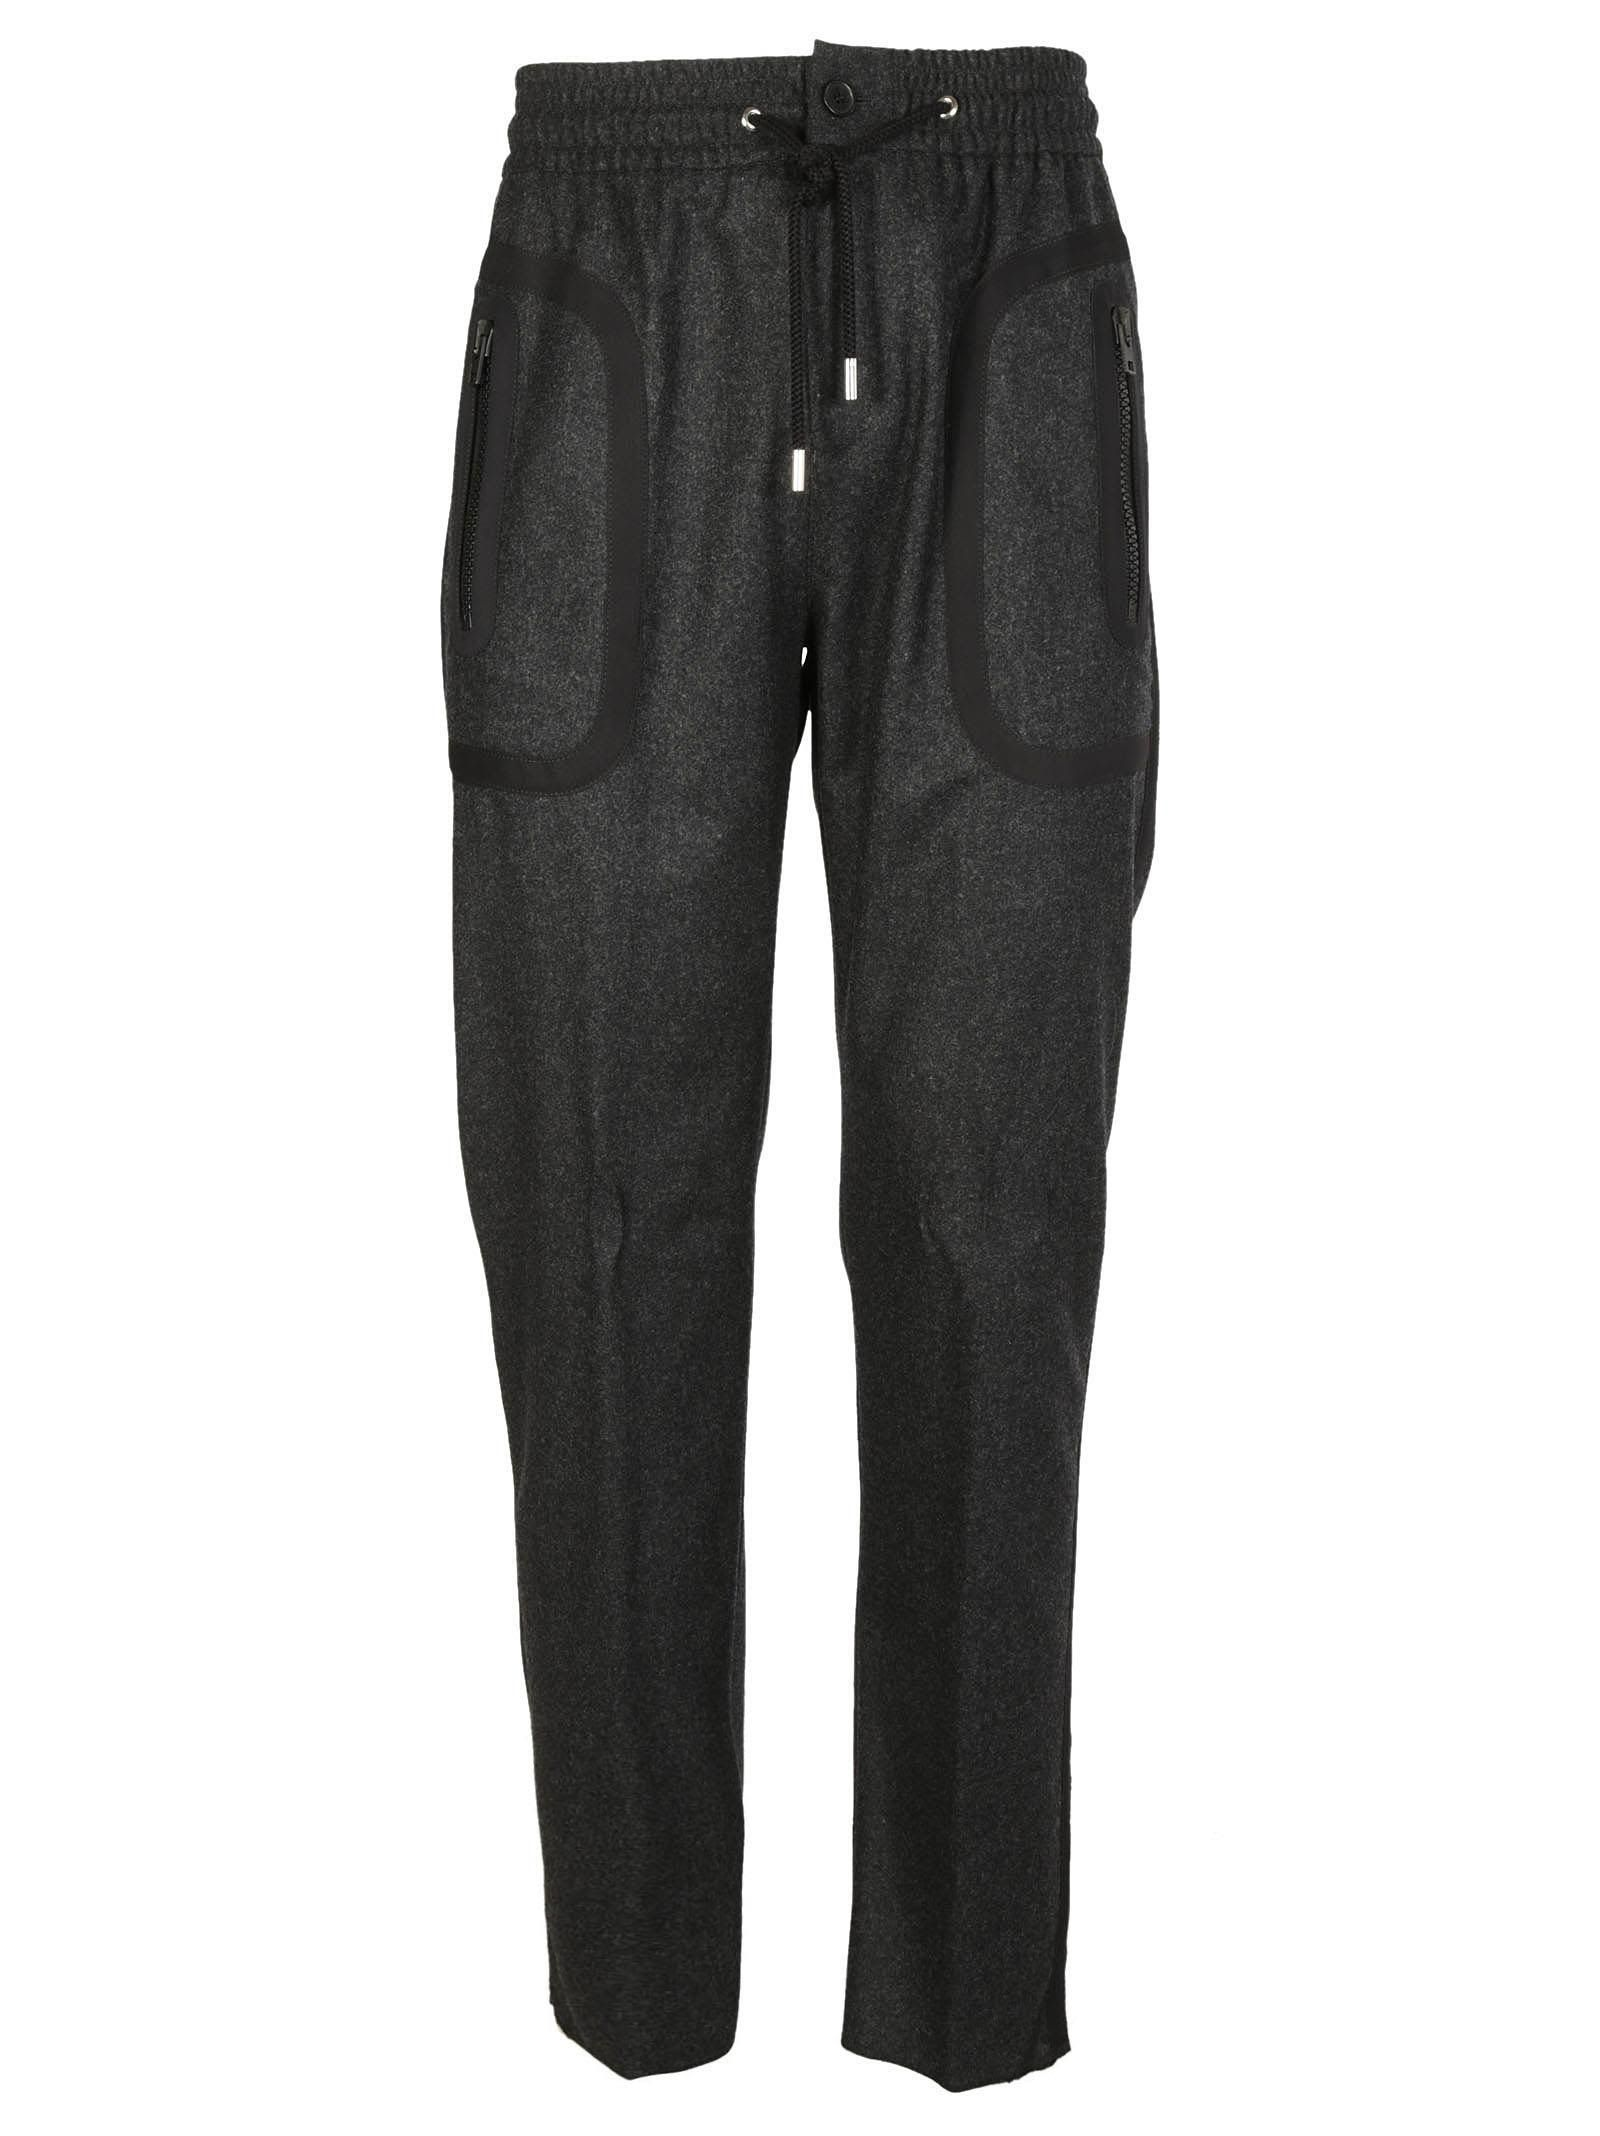 7263452c7f GIVENCHY SIZE ZIPPED TRACK PANTS.  givenchy  cloth   Givenchy Man